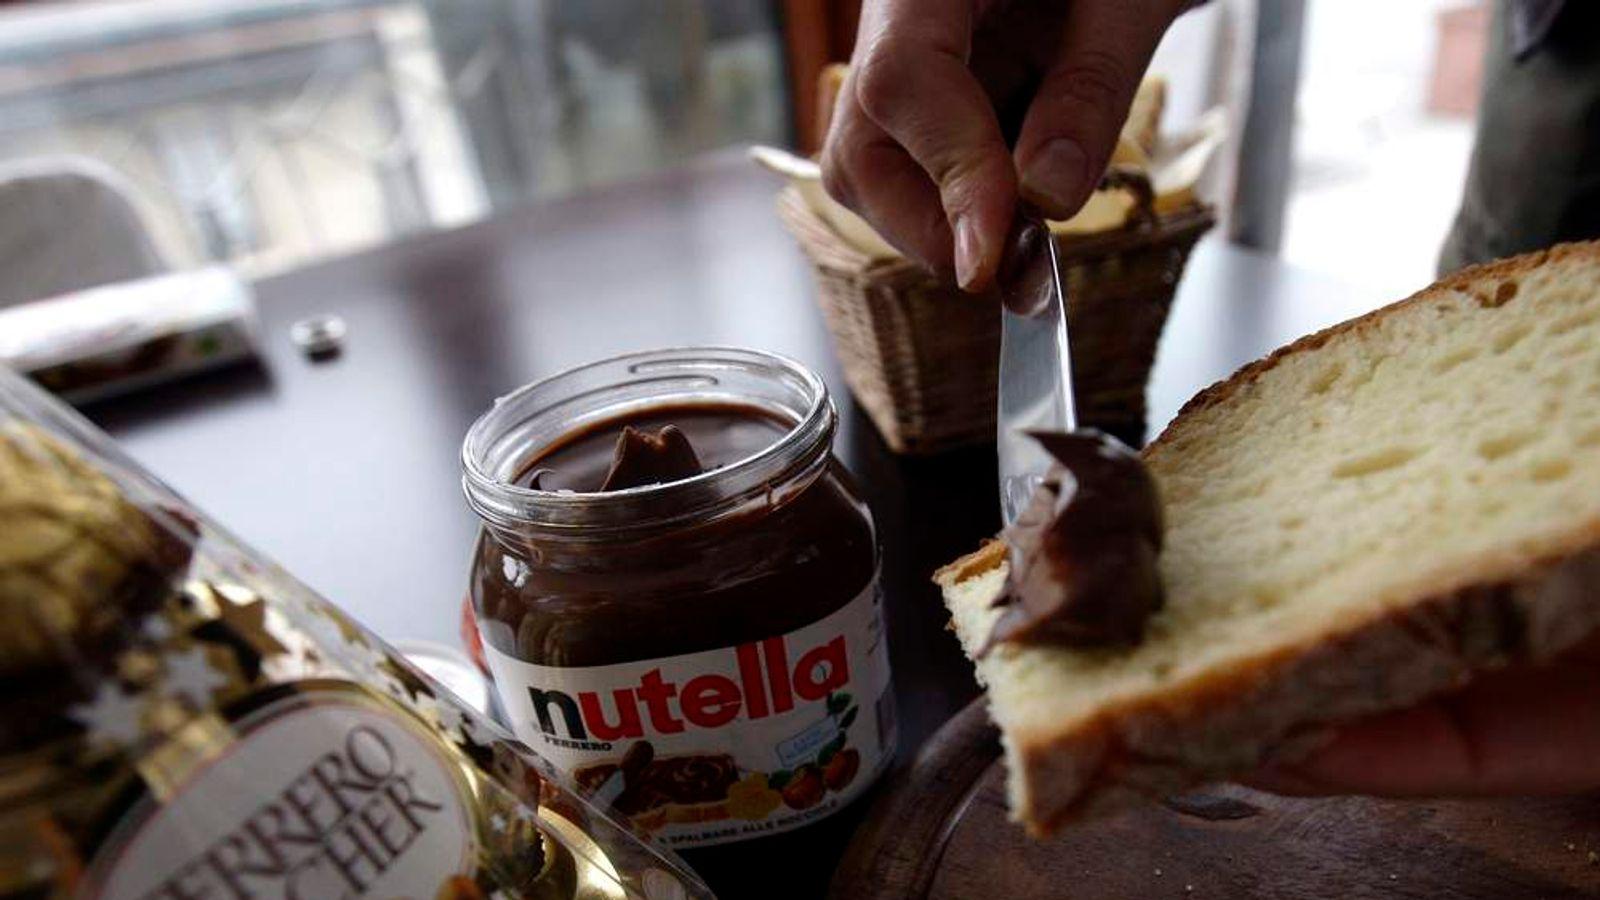 Nutella Online Adventskalender